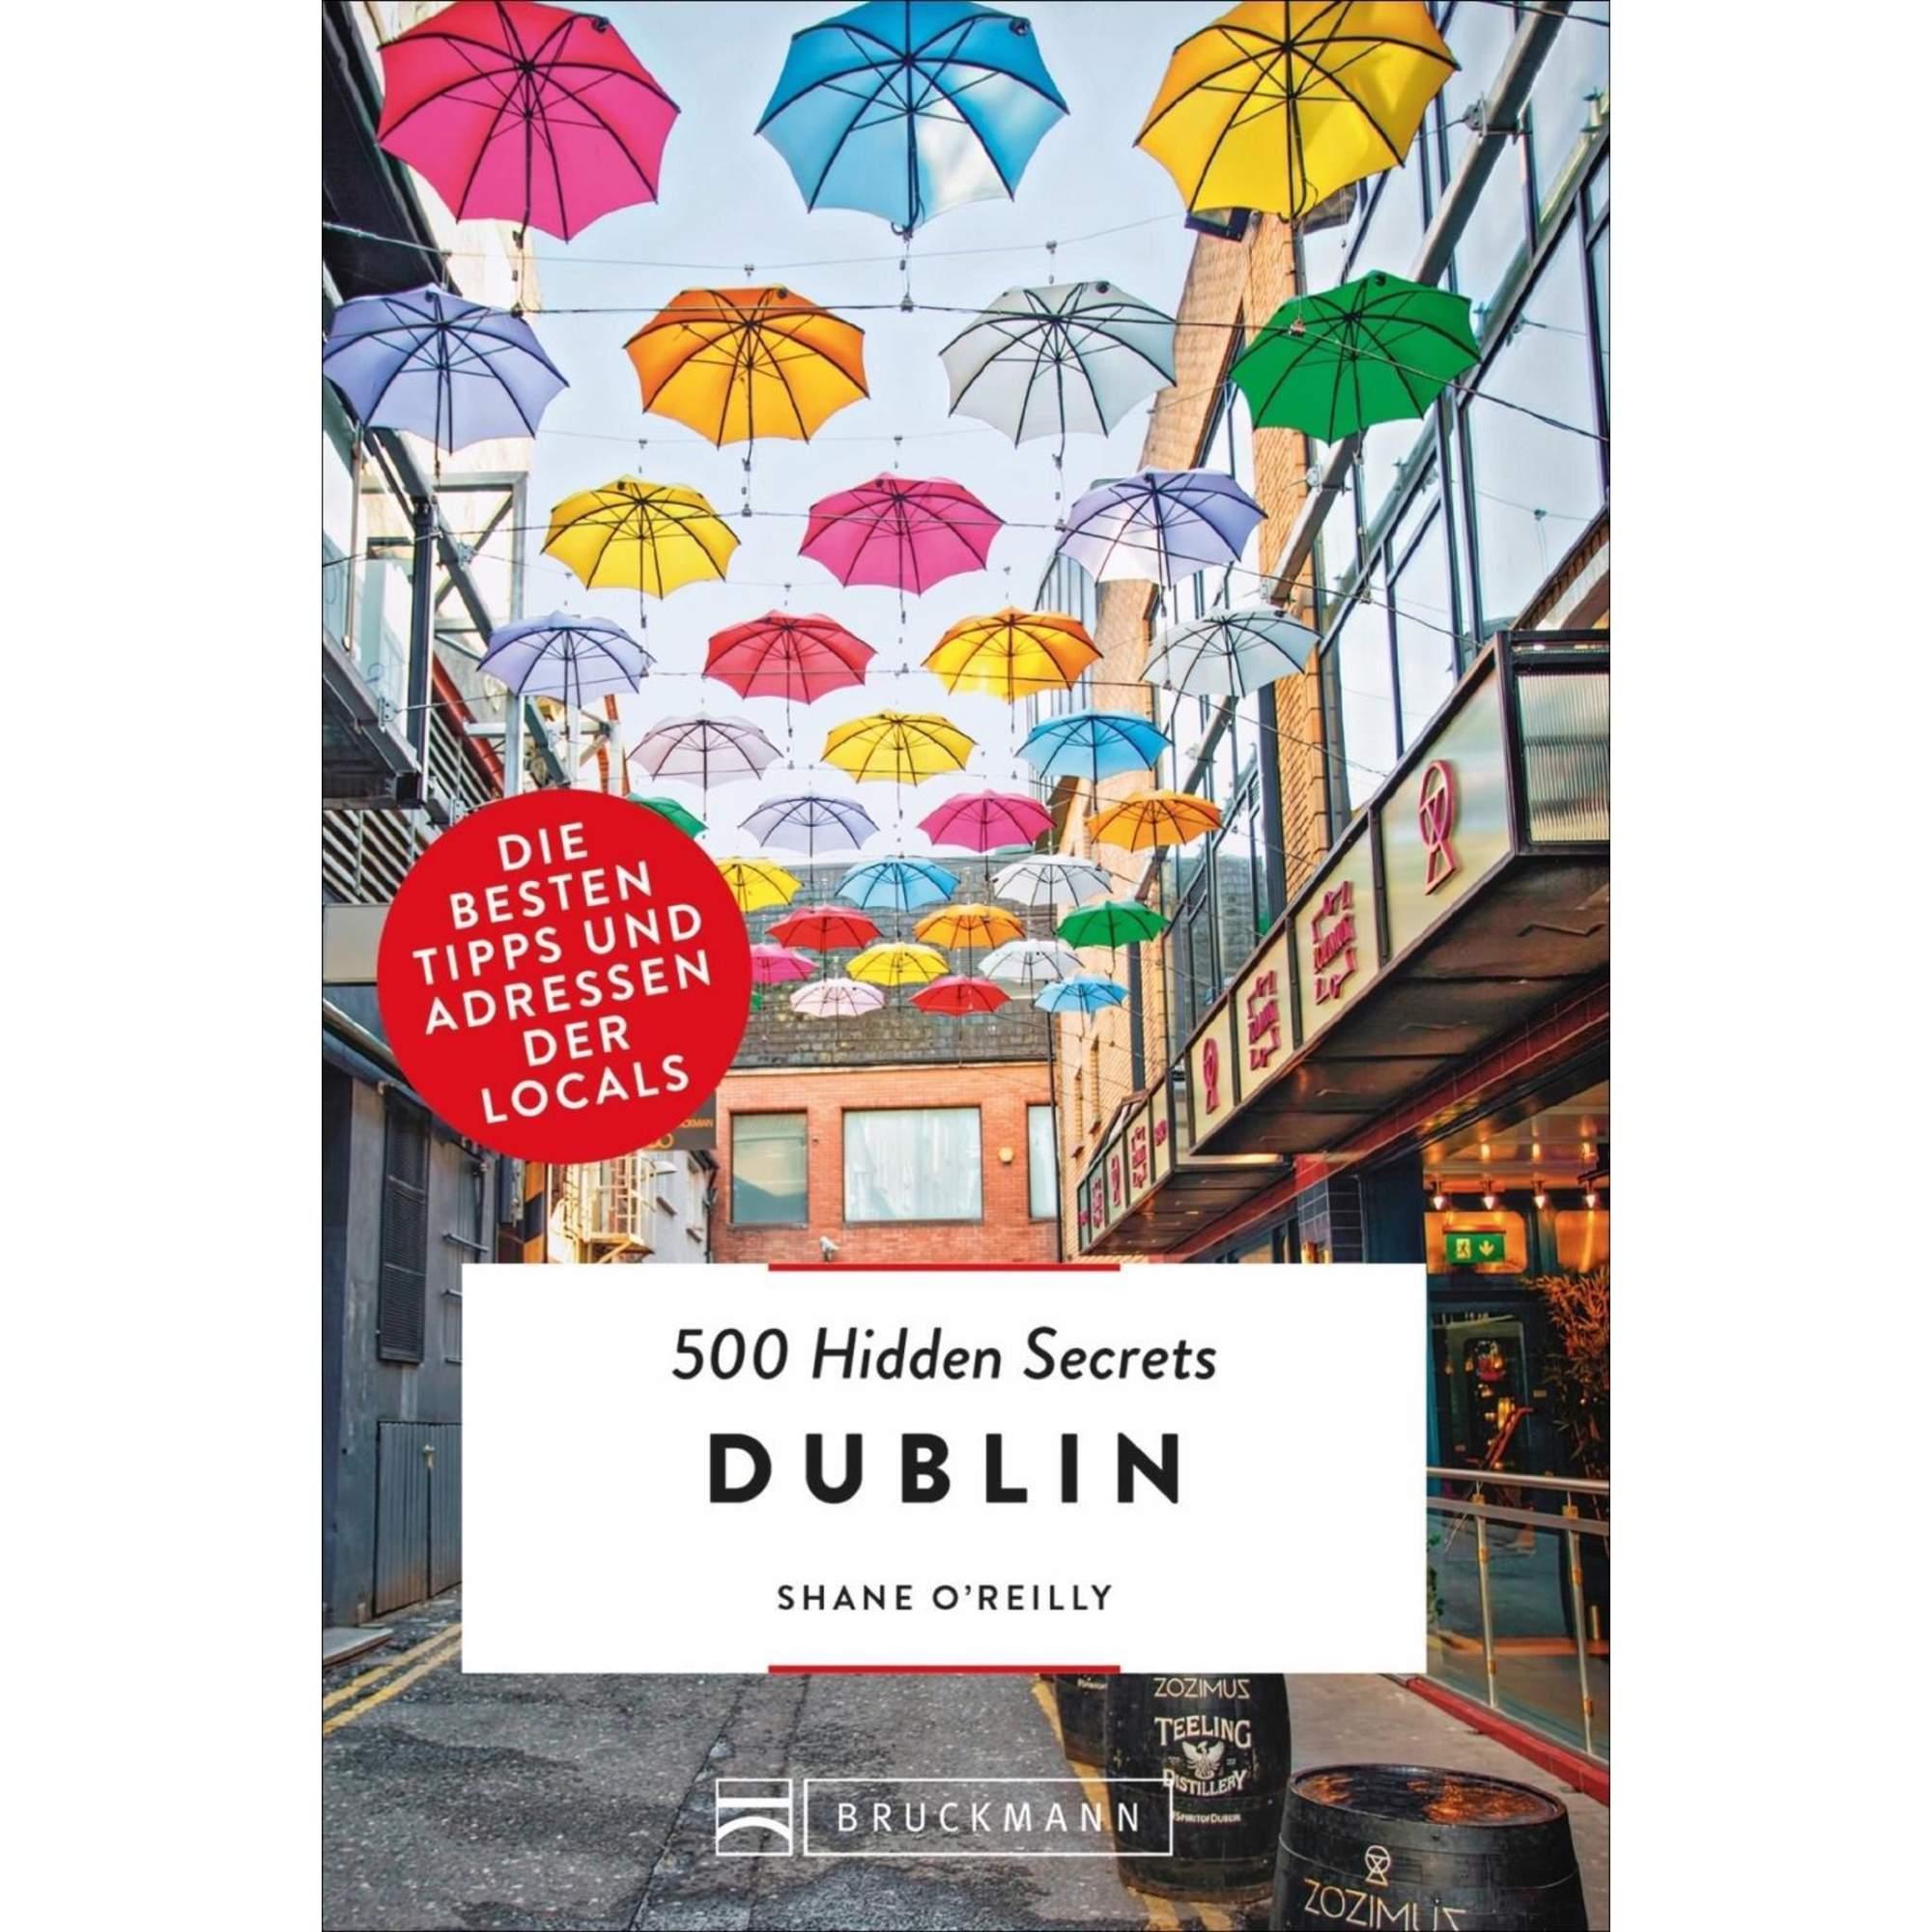 500 Hidden Secrets Dublin, 16,99 Euro